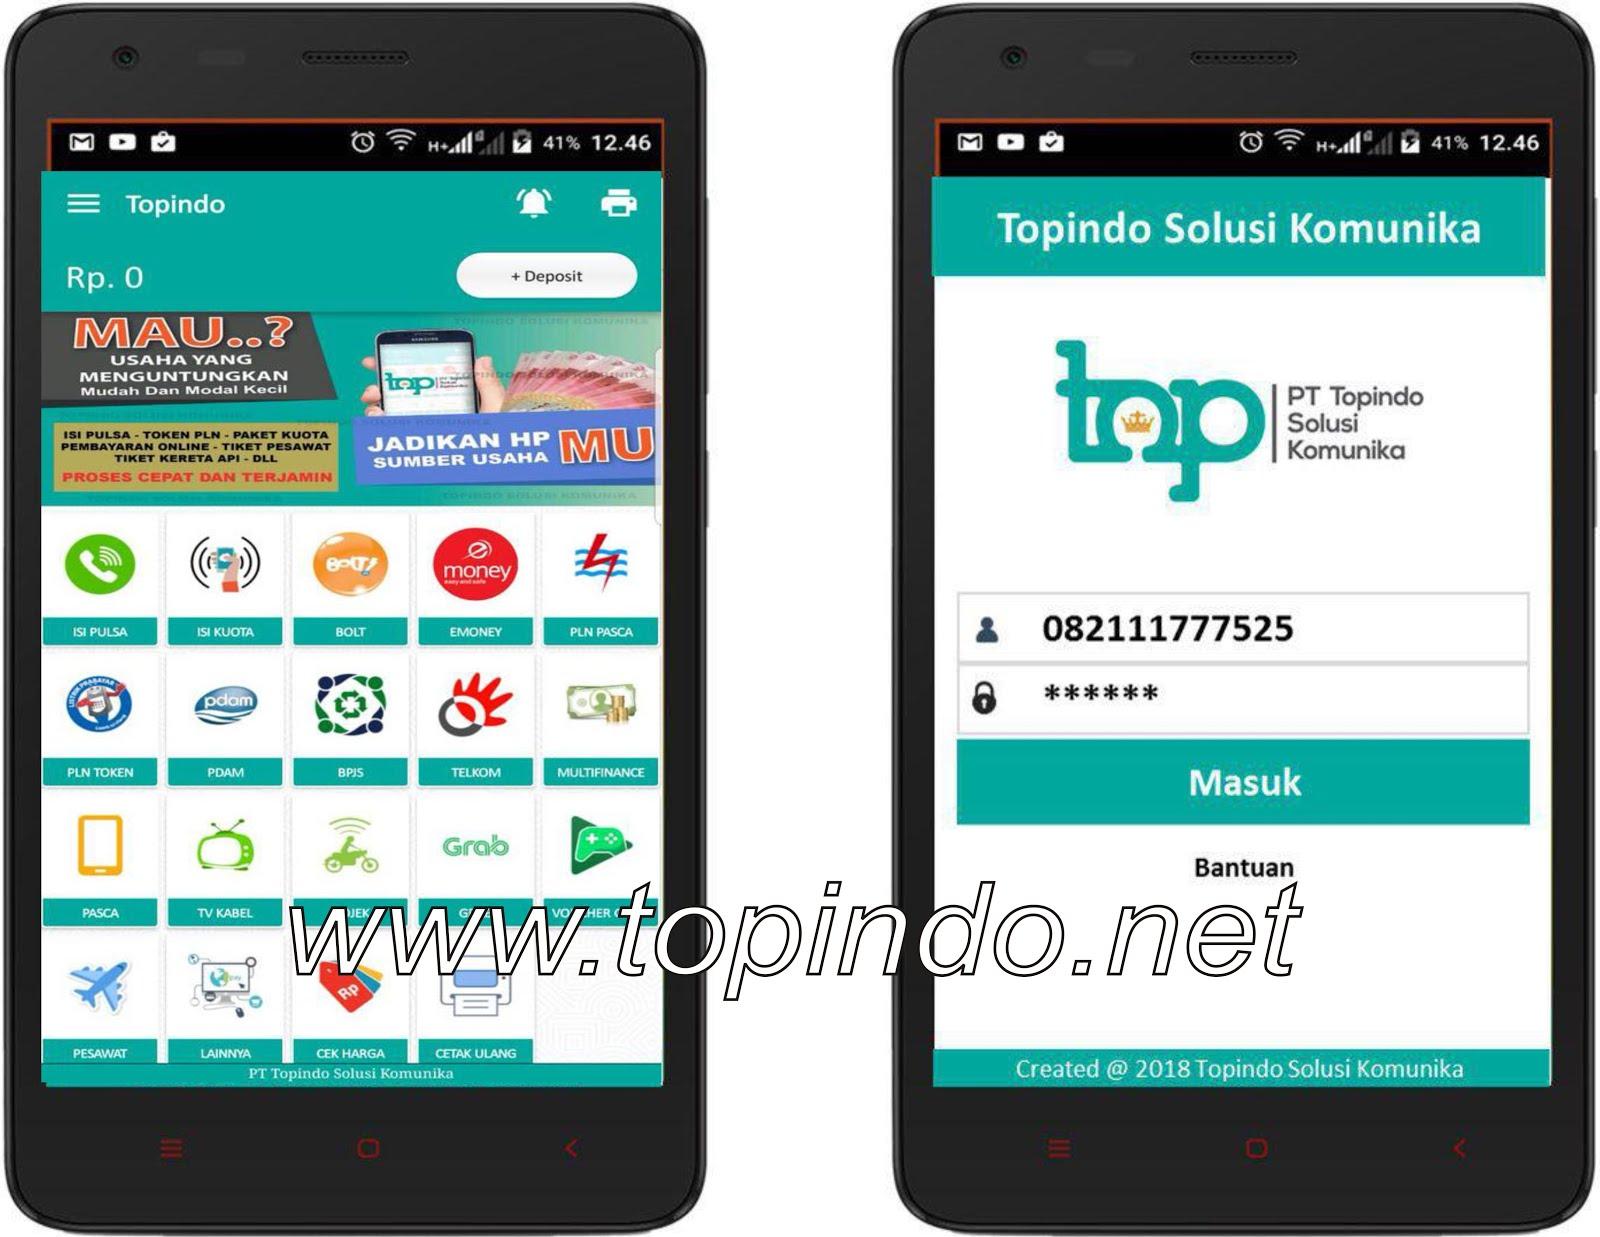 aplikasi topindo, download aplikasi topindo solusi komunika, apk android topindo